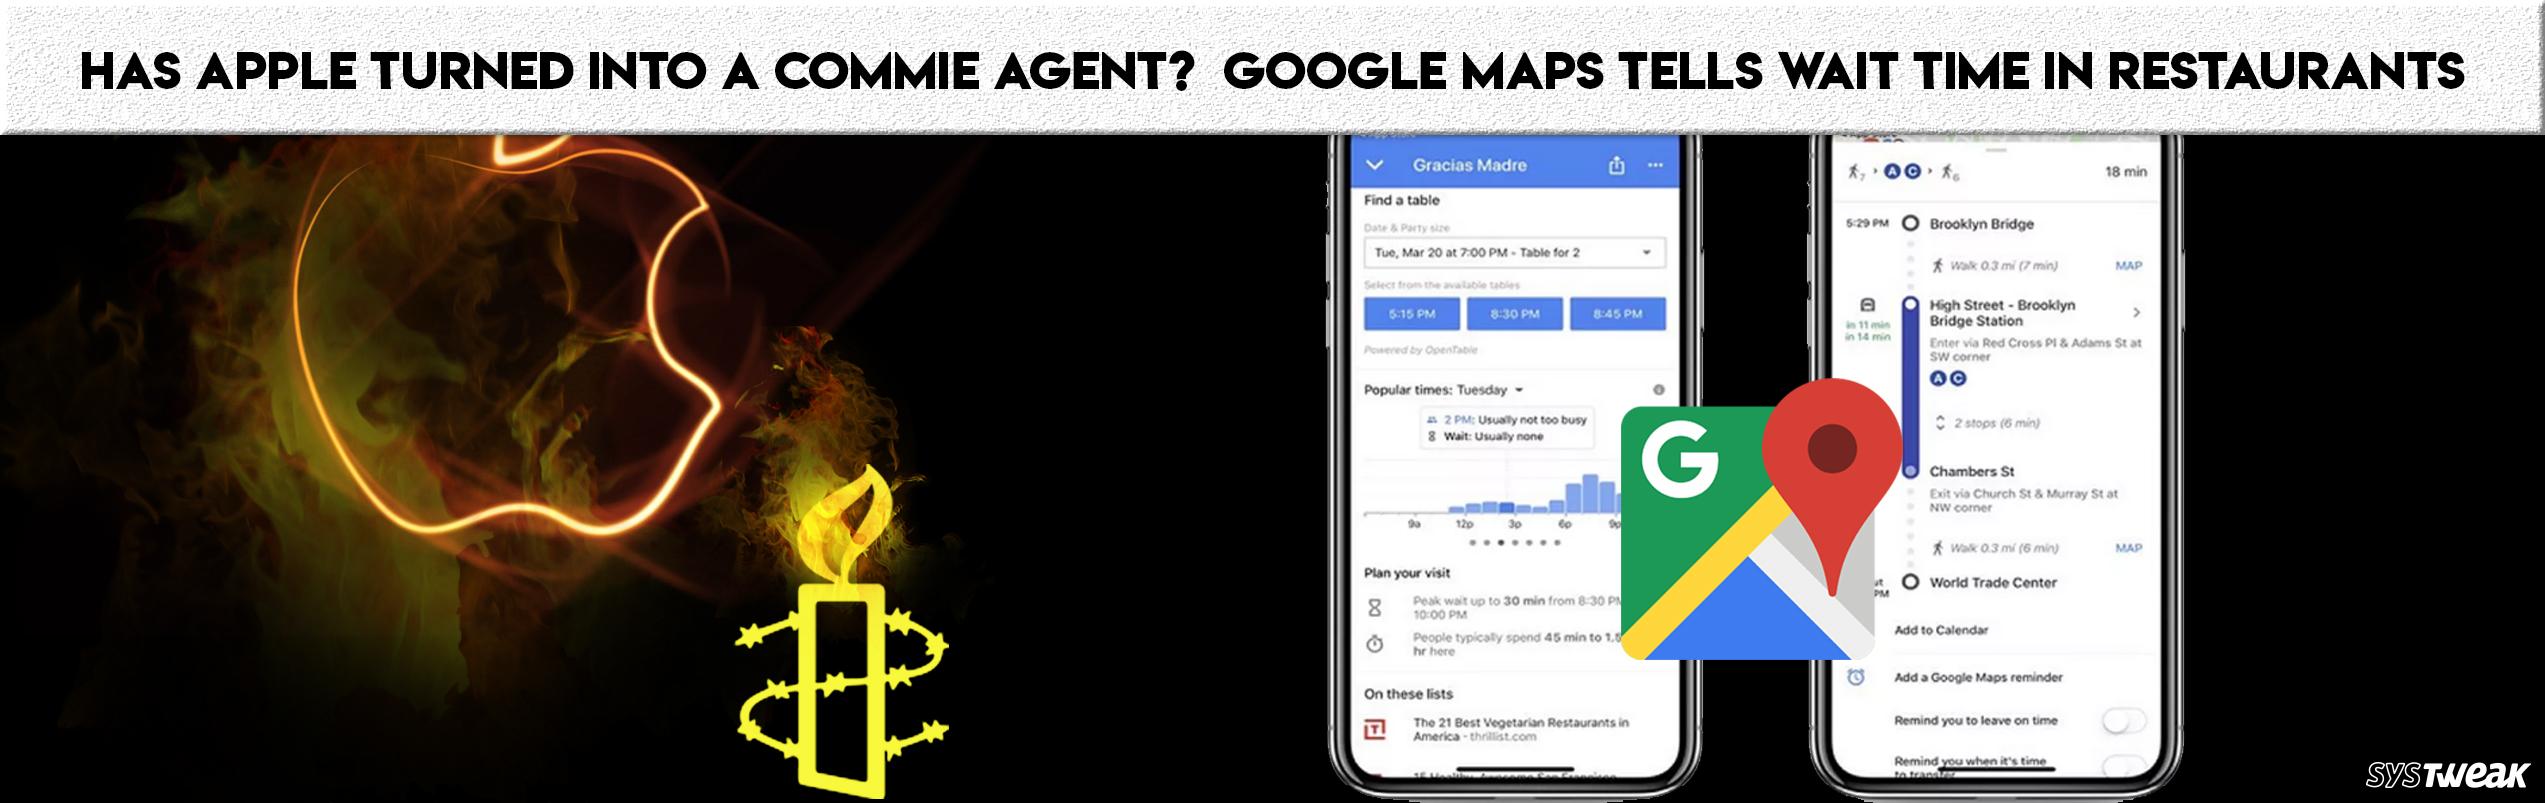 Newsletter: Apple: Amnesty International's Next Target & Google Map's New Feature